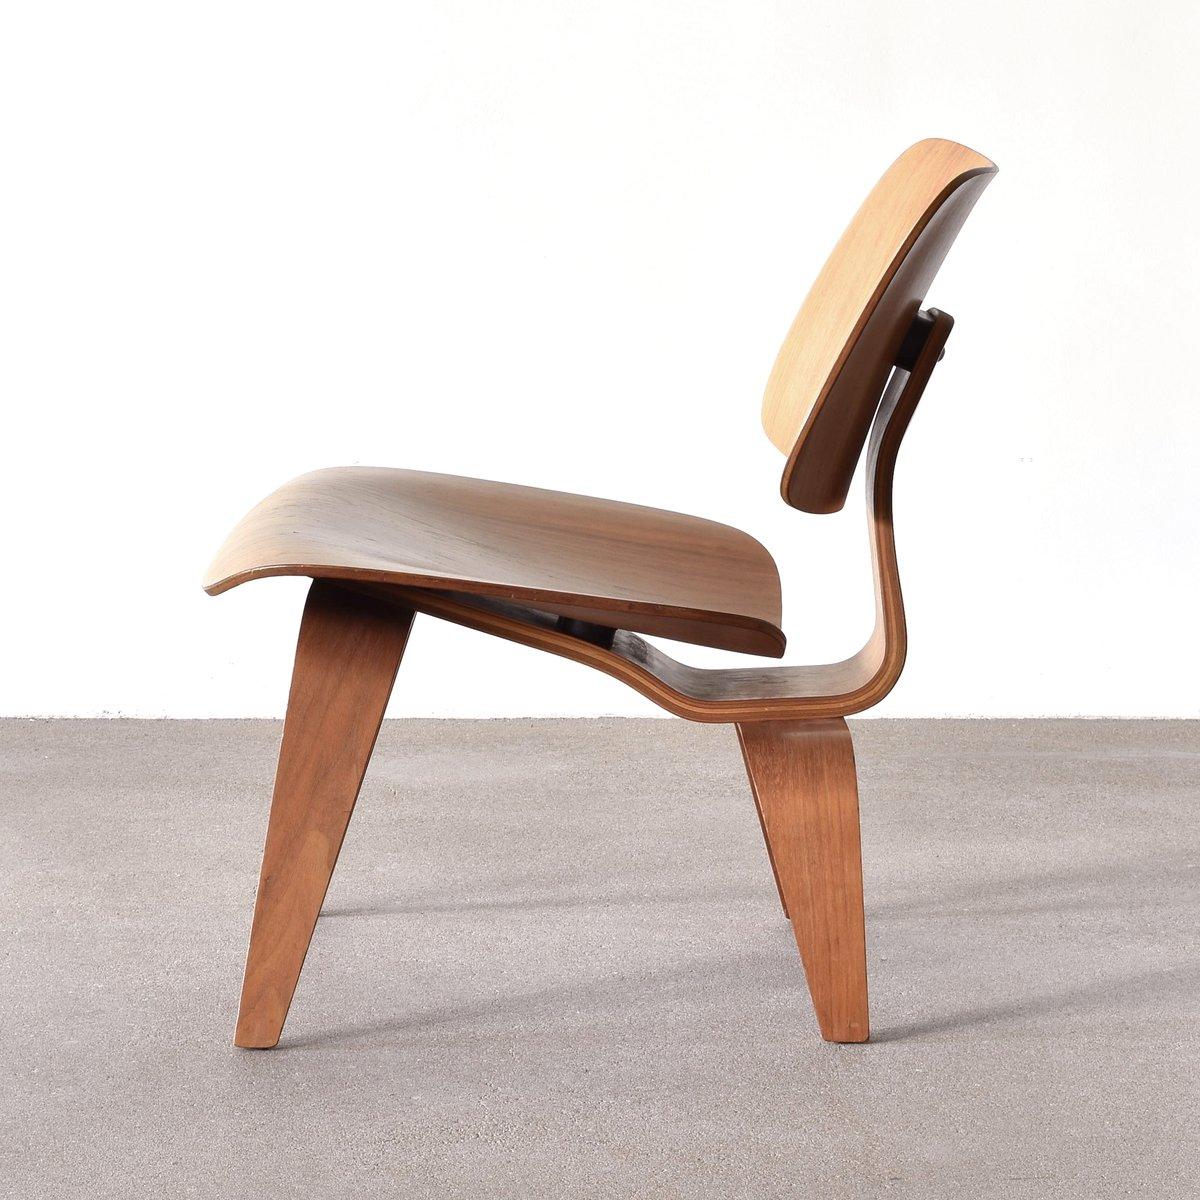 amerikanischer lcw nussholz lounge stuhl von charles ray. Black Bedroom Furniture Sets. Home Design Ideas